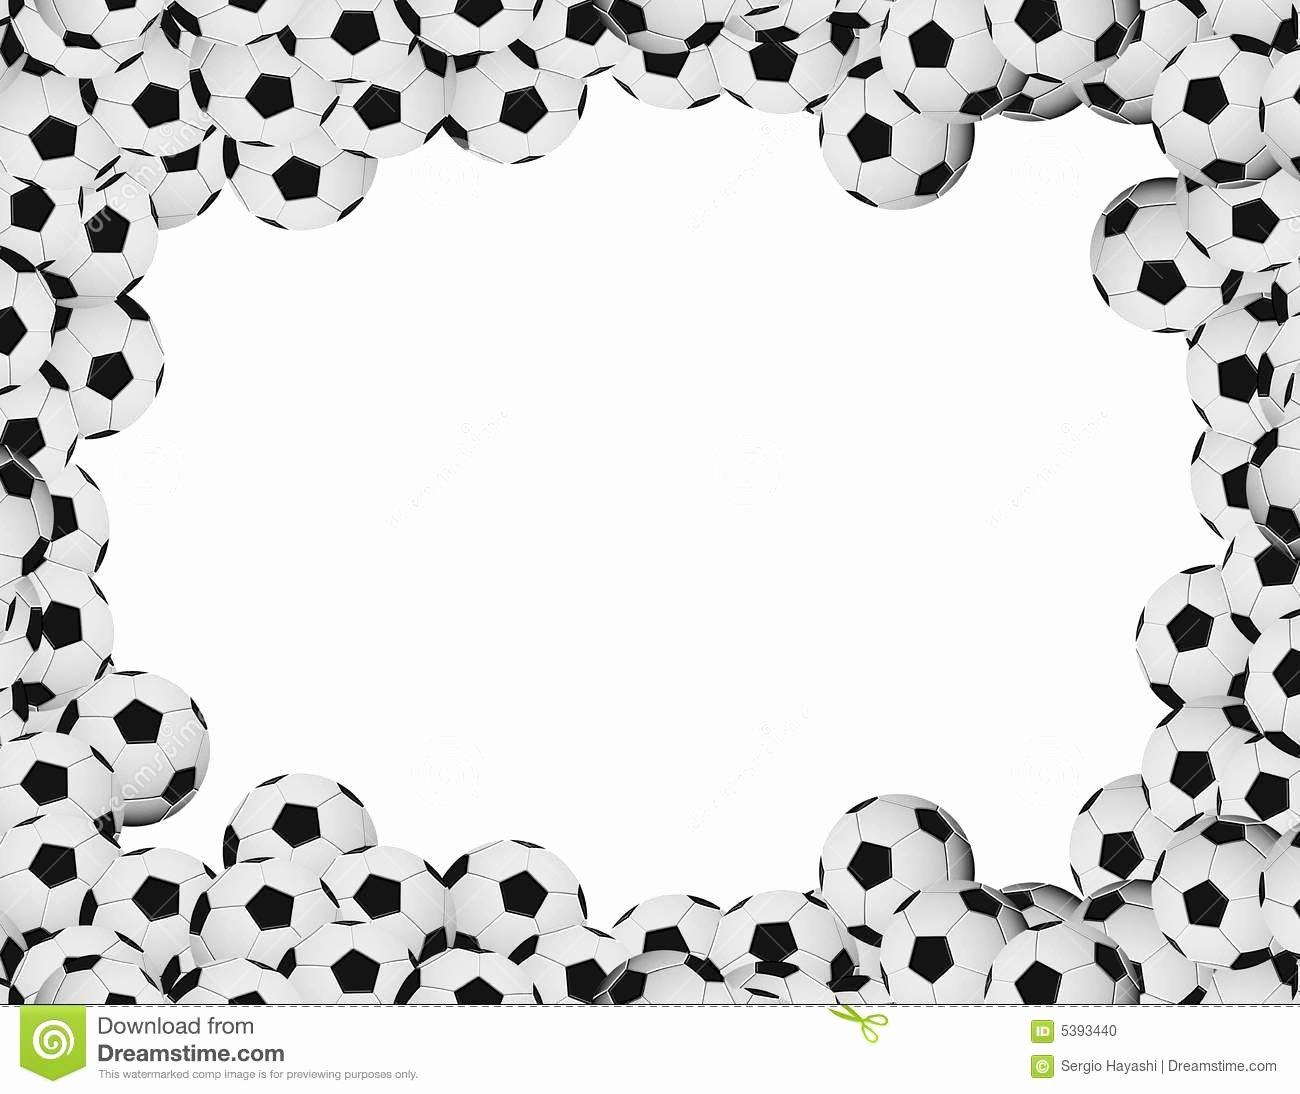 Free Football Border Template Unique soccer Frame Stock Illustration Illustration Of Sphere